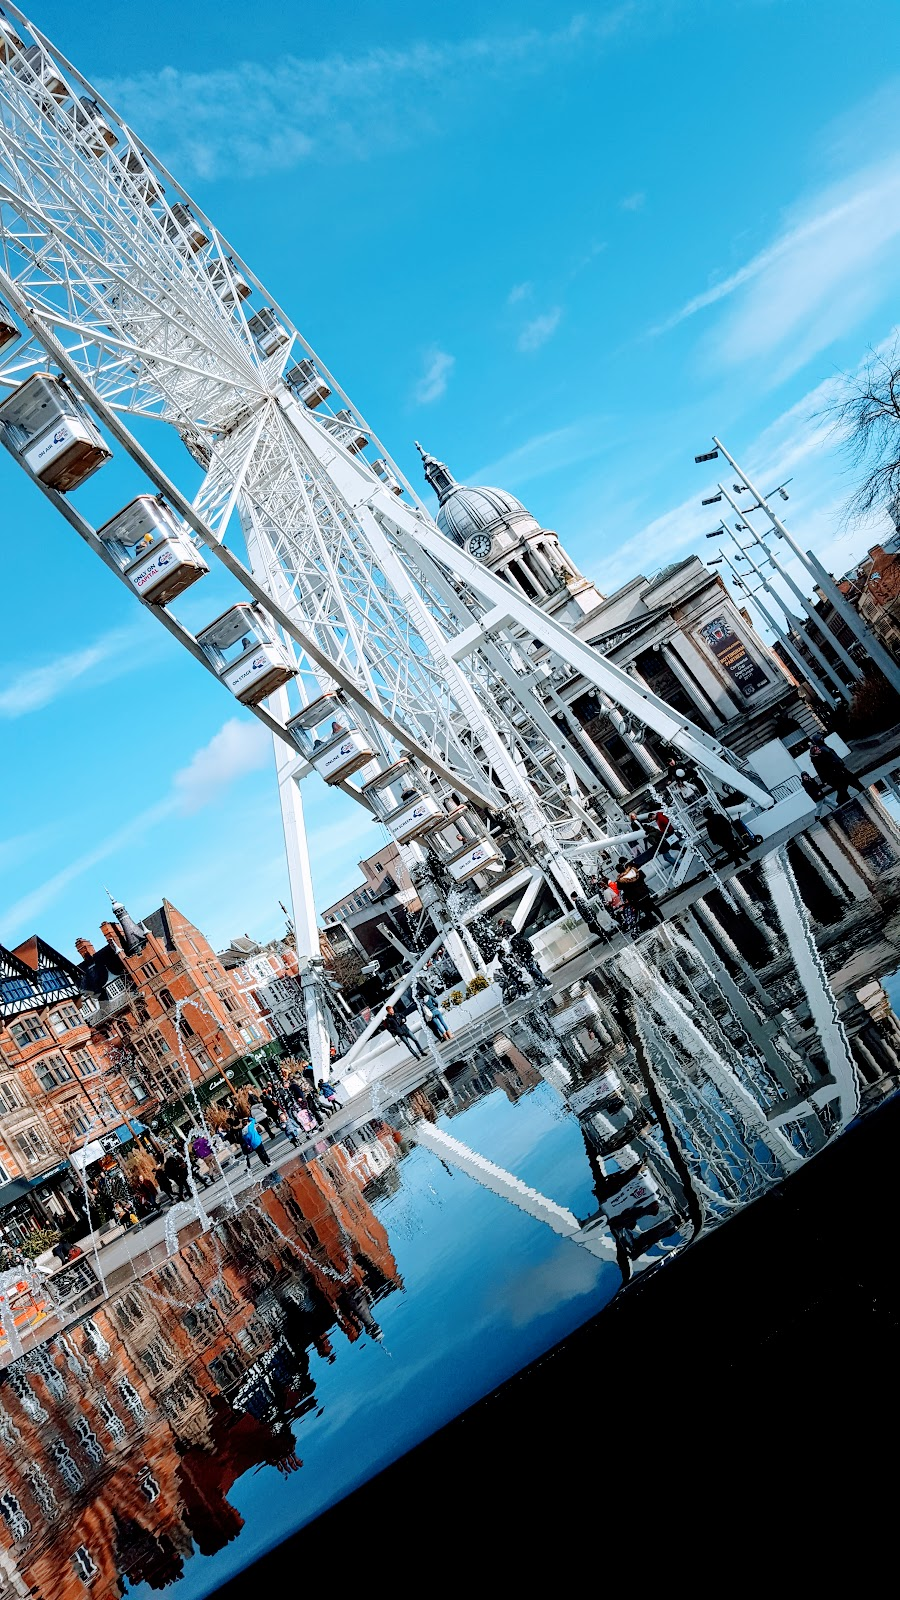 Market Square Nottingham: The Wednesday Blog Hop